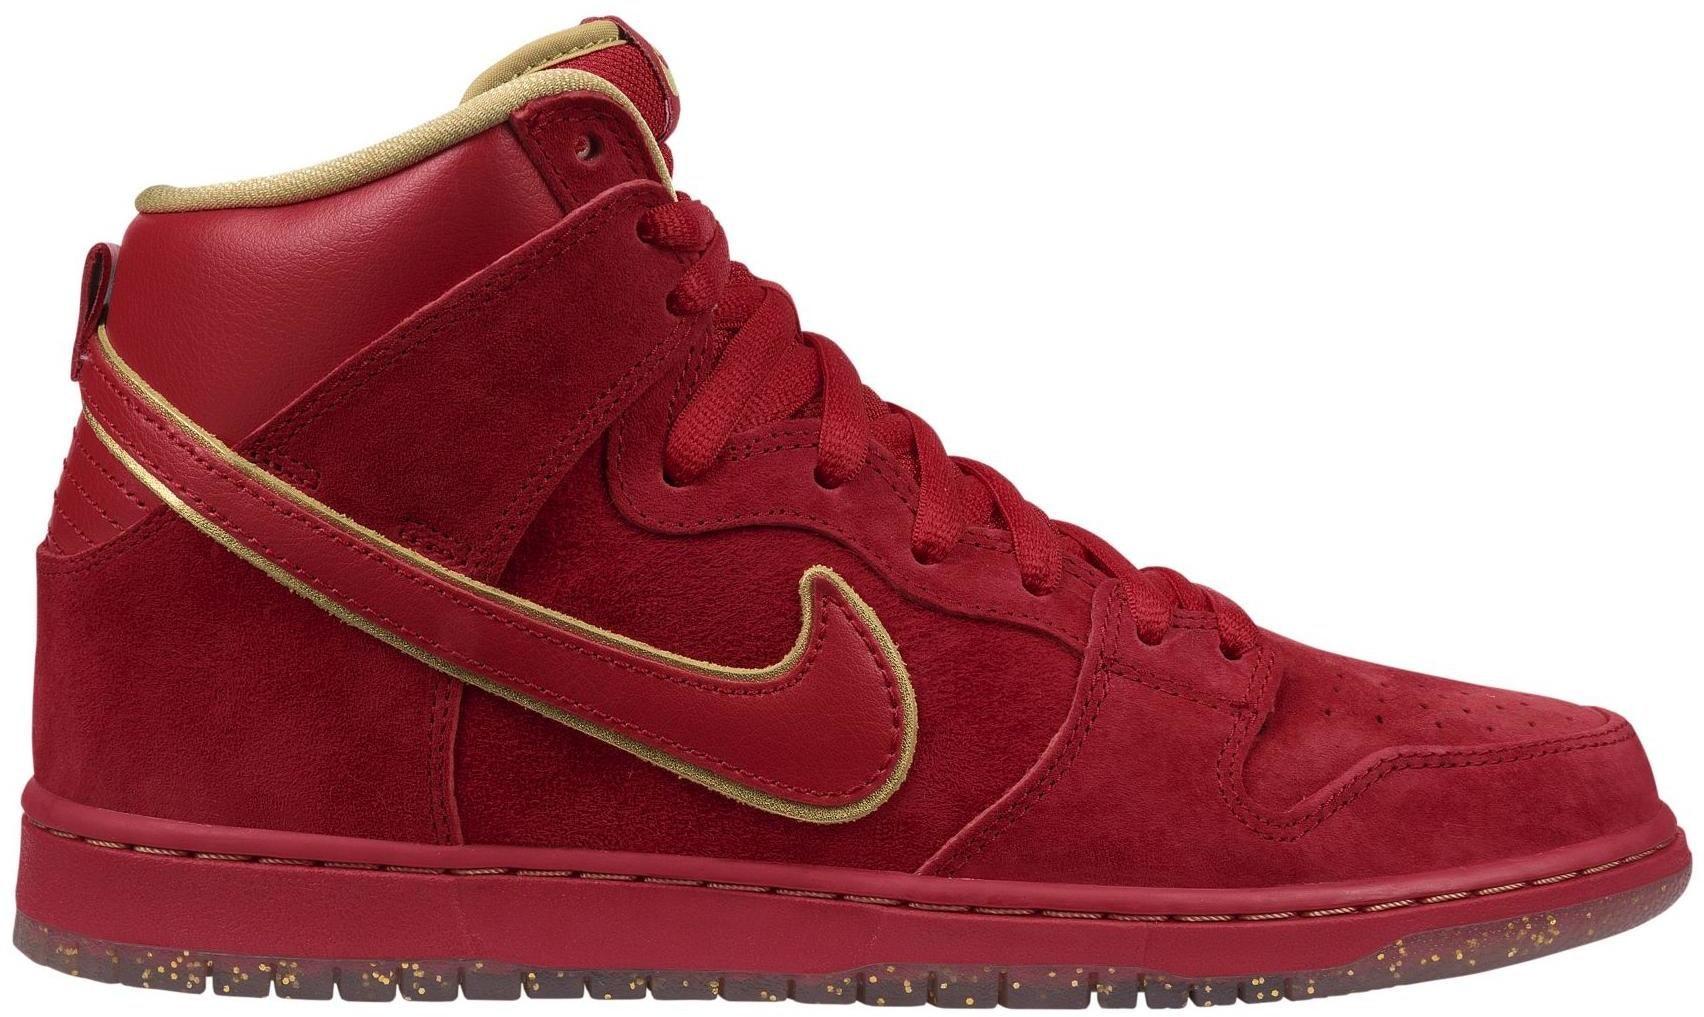 wholesale dealer 261fb 3a41f Nike Air Force 1 High 07 Men u0027s Shoe nike high. BASKET Nike Sb Dunk High  Boot Hommes Hi Top Trainers 8063